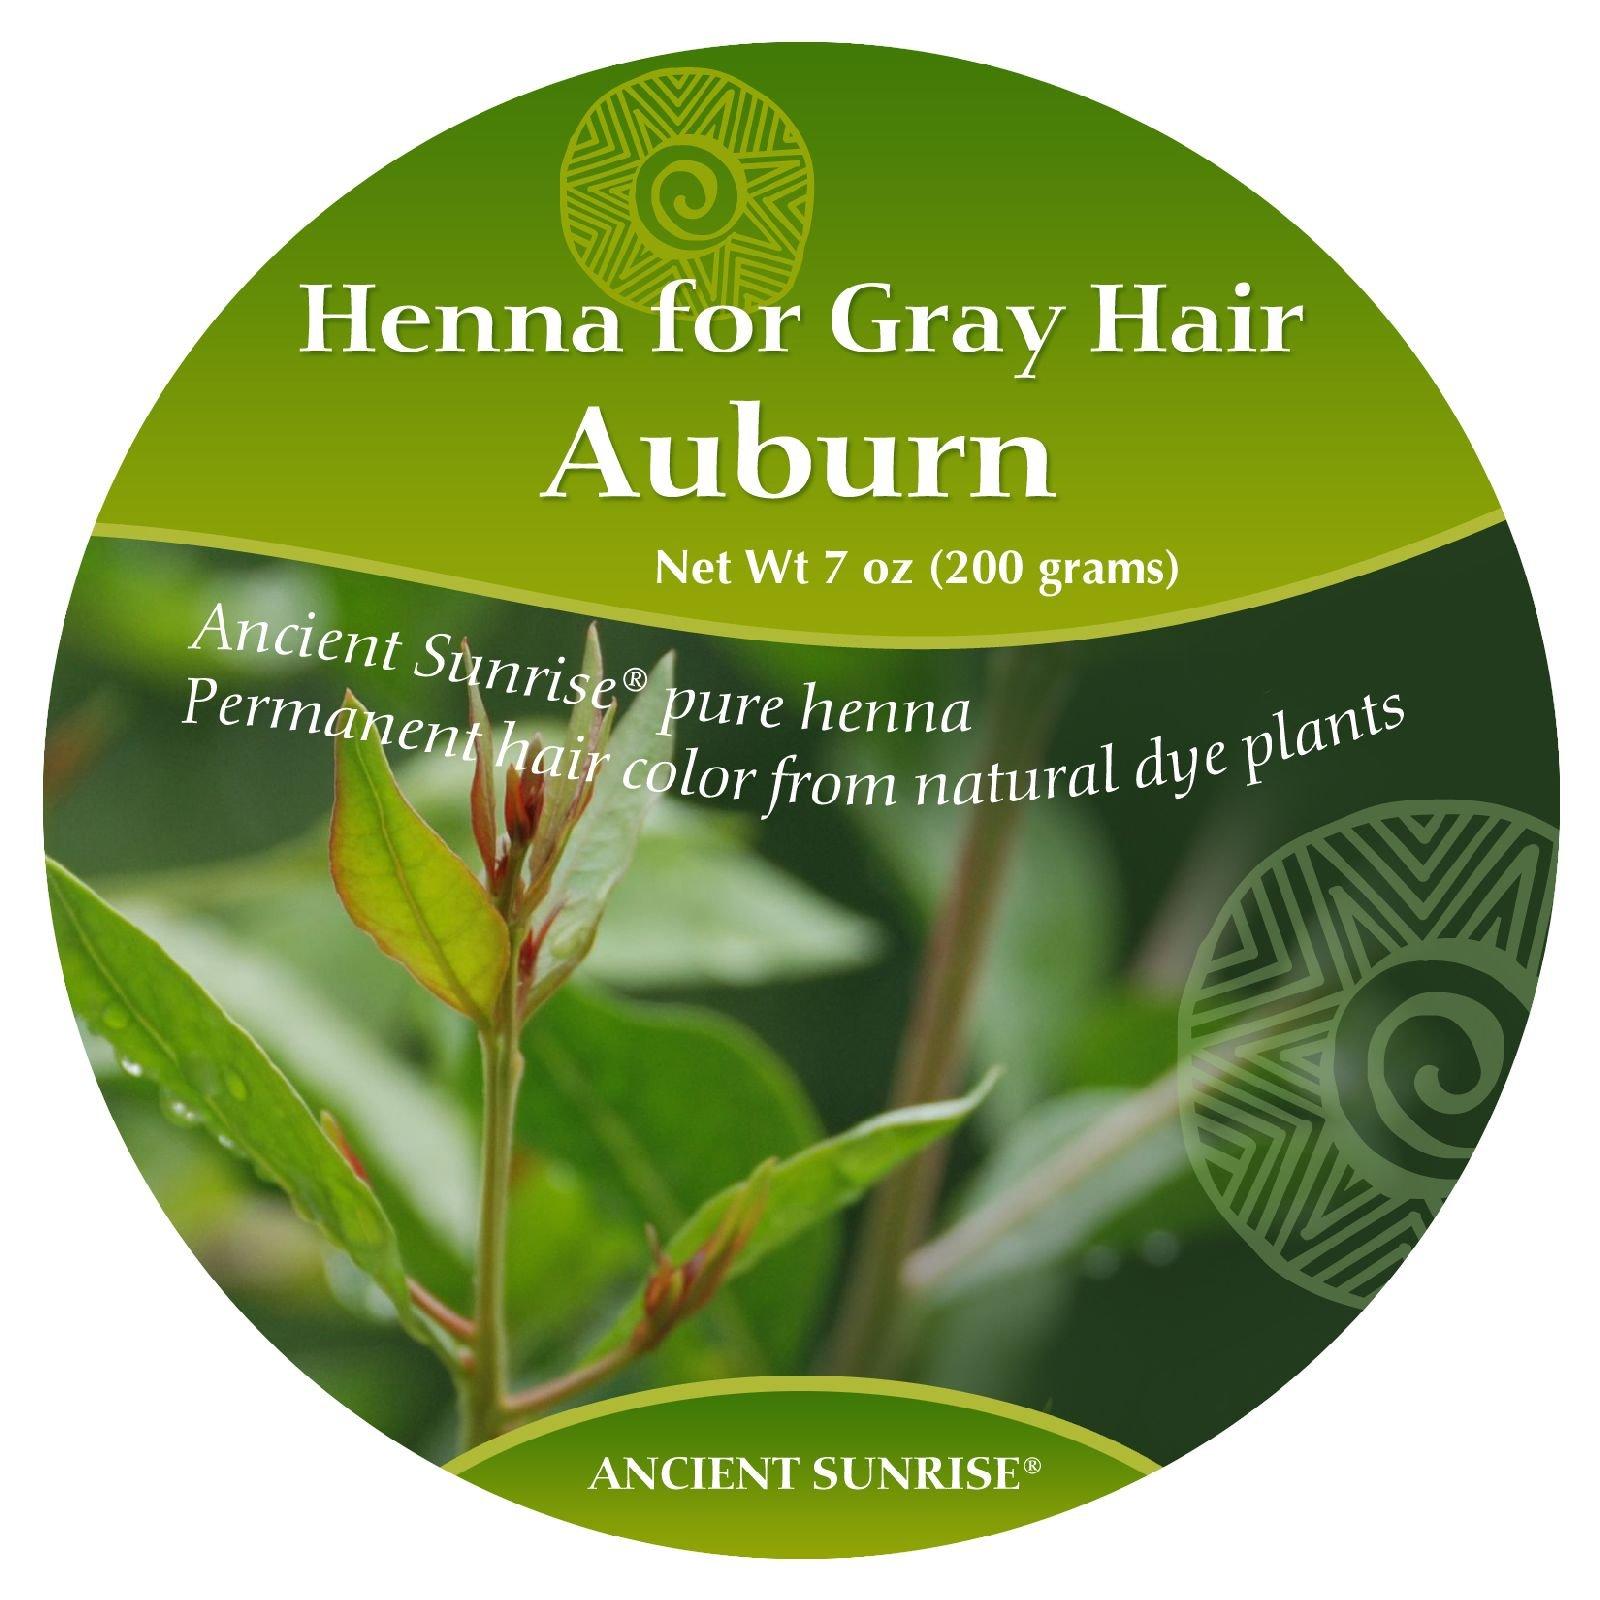 Ancient Sunrise Henna For Gray Hair Auburn Kit by Ancient Sunrise